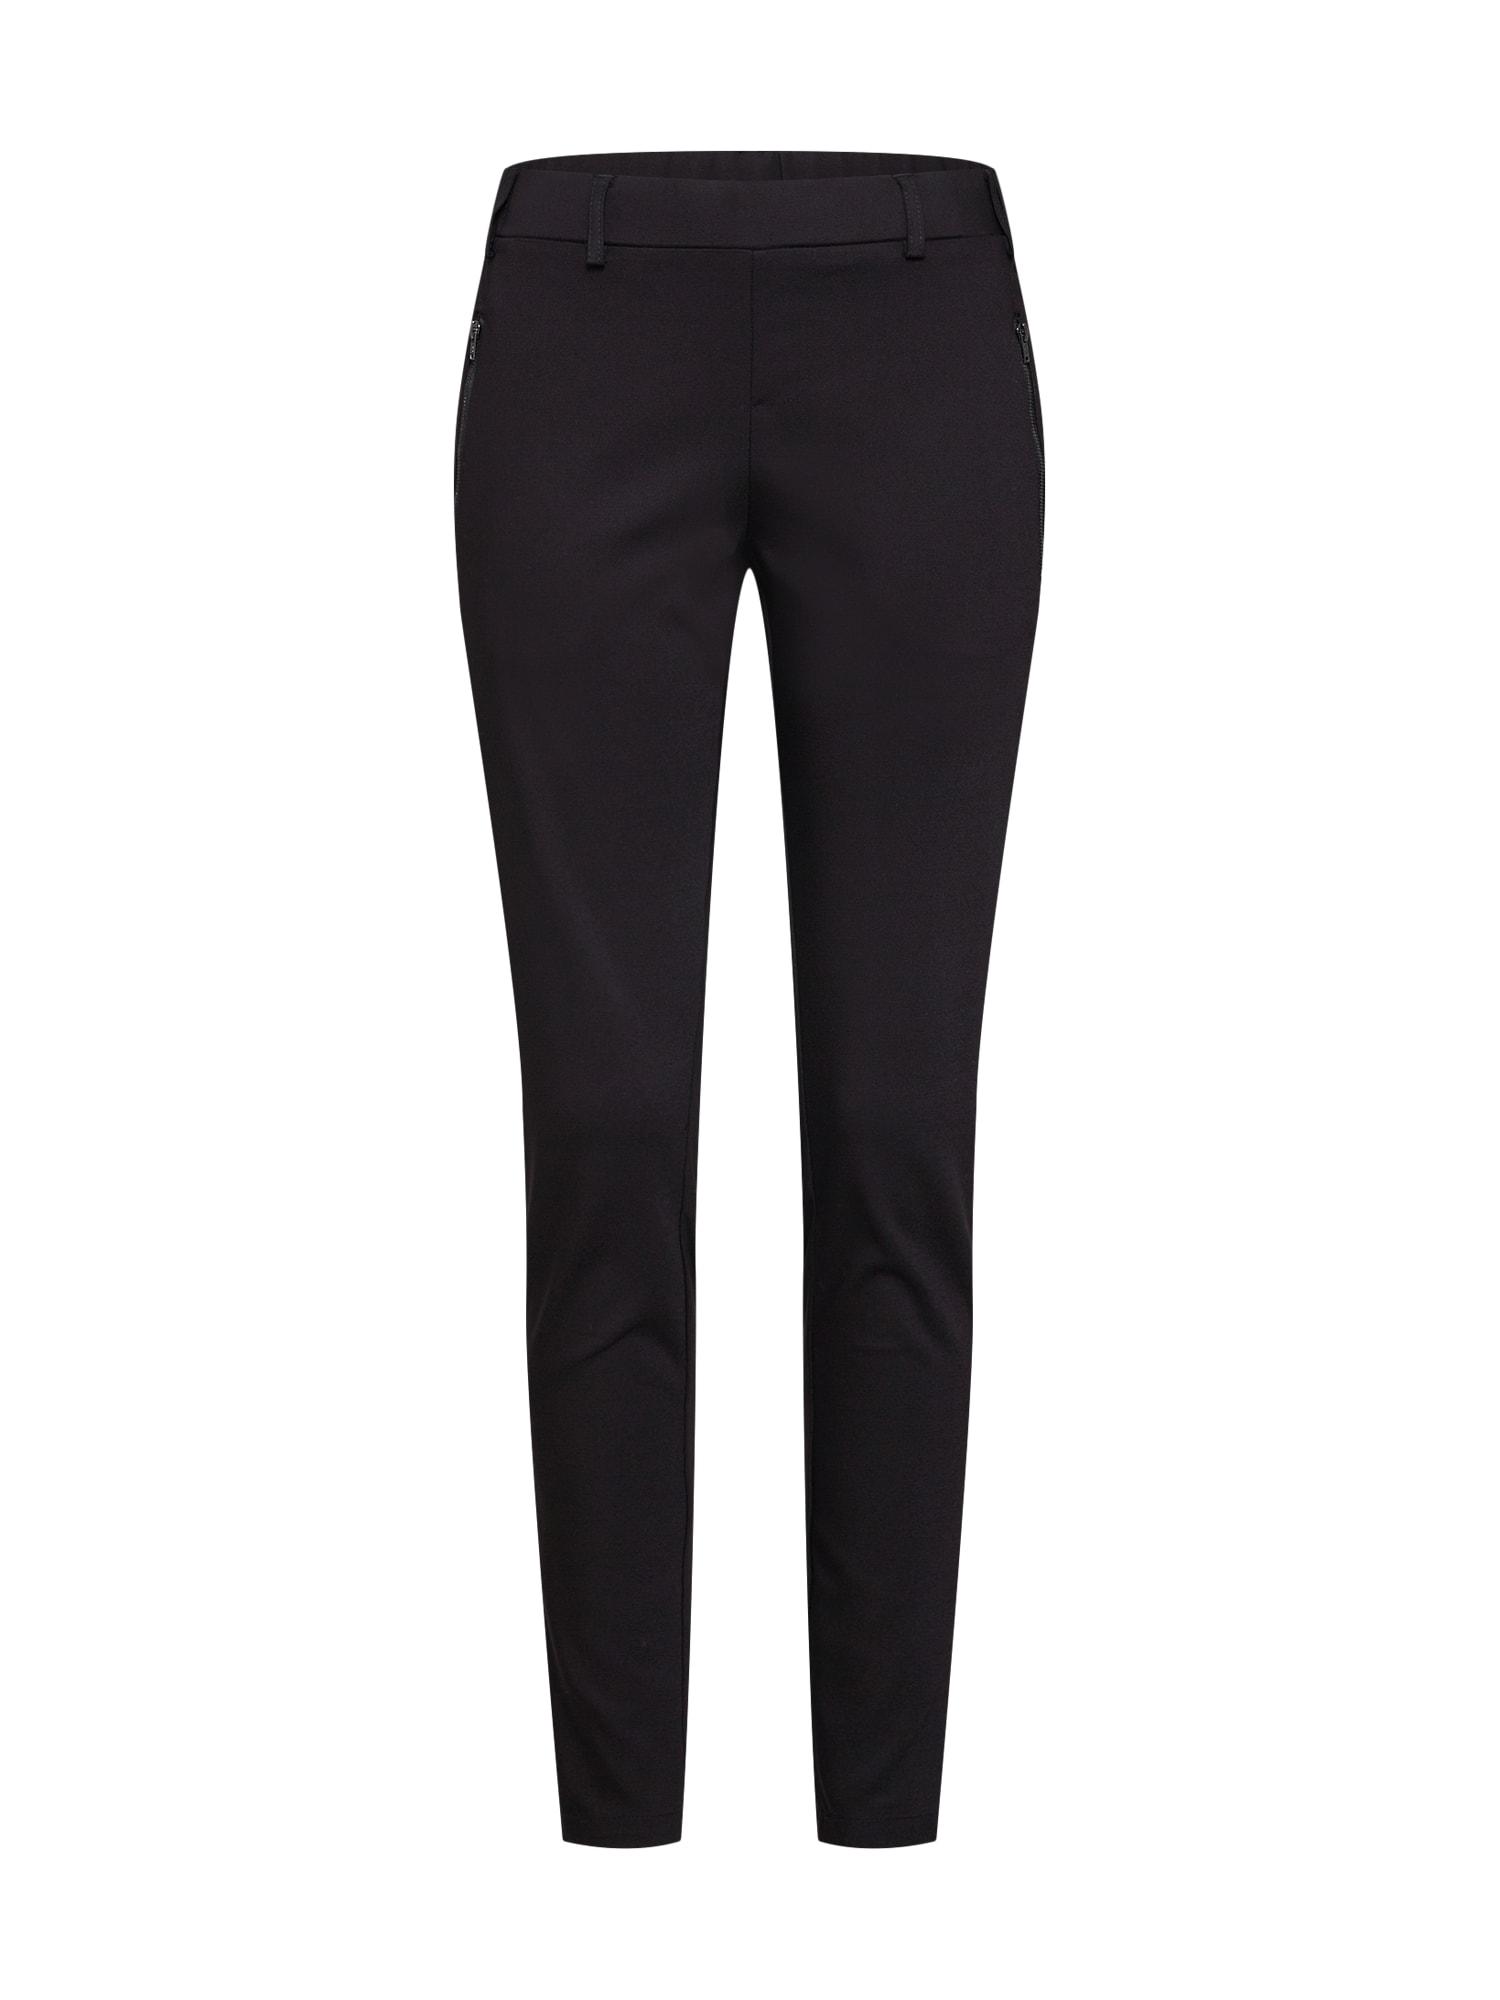 Kaffe Kelnės su kantu 'Vera Pants' juoda